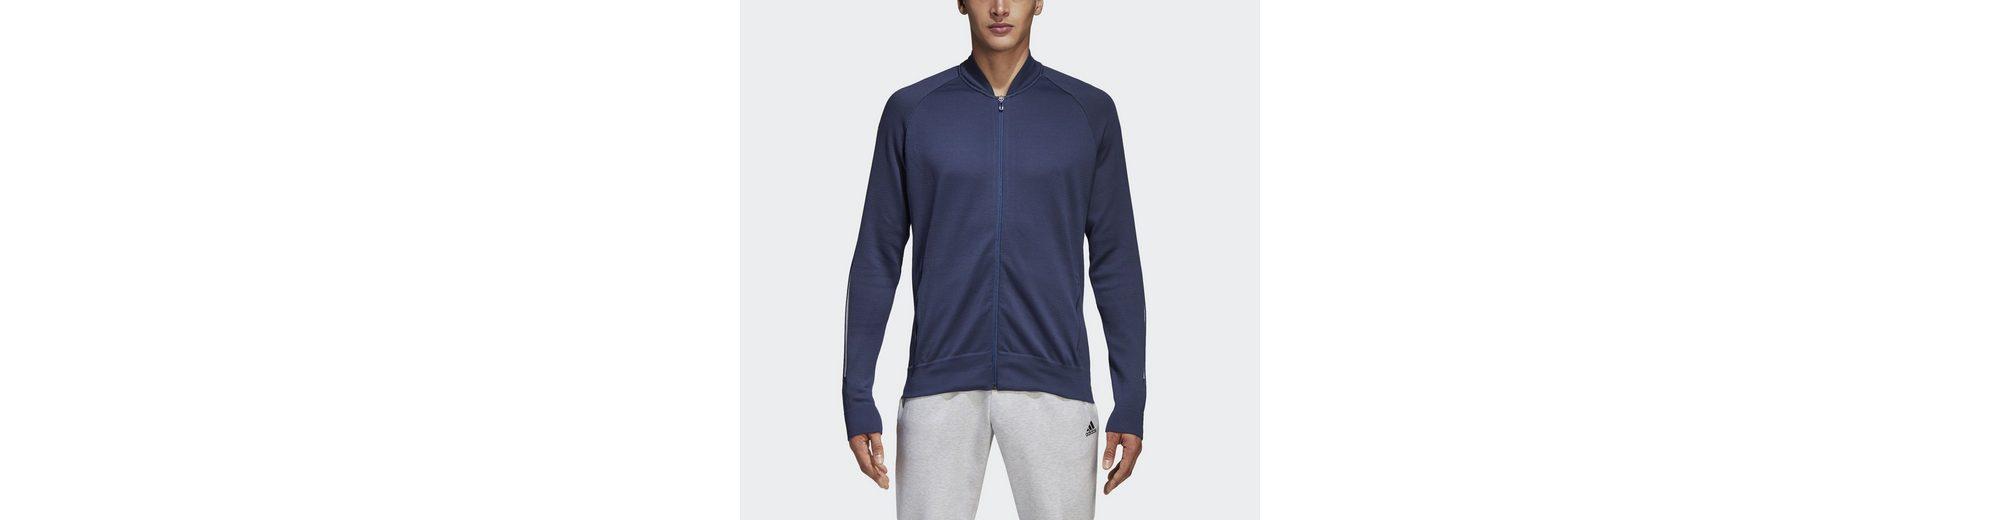 Longpullover Knit Bomberjacke Adidas Id Performance 7q44w5Hf